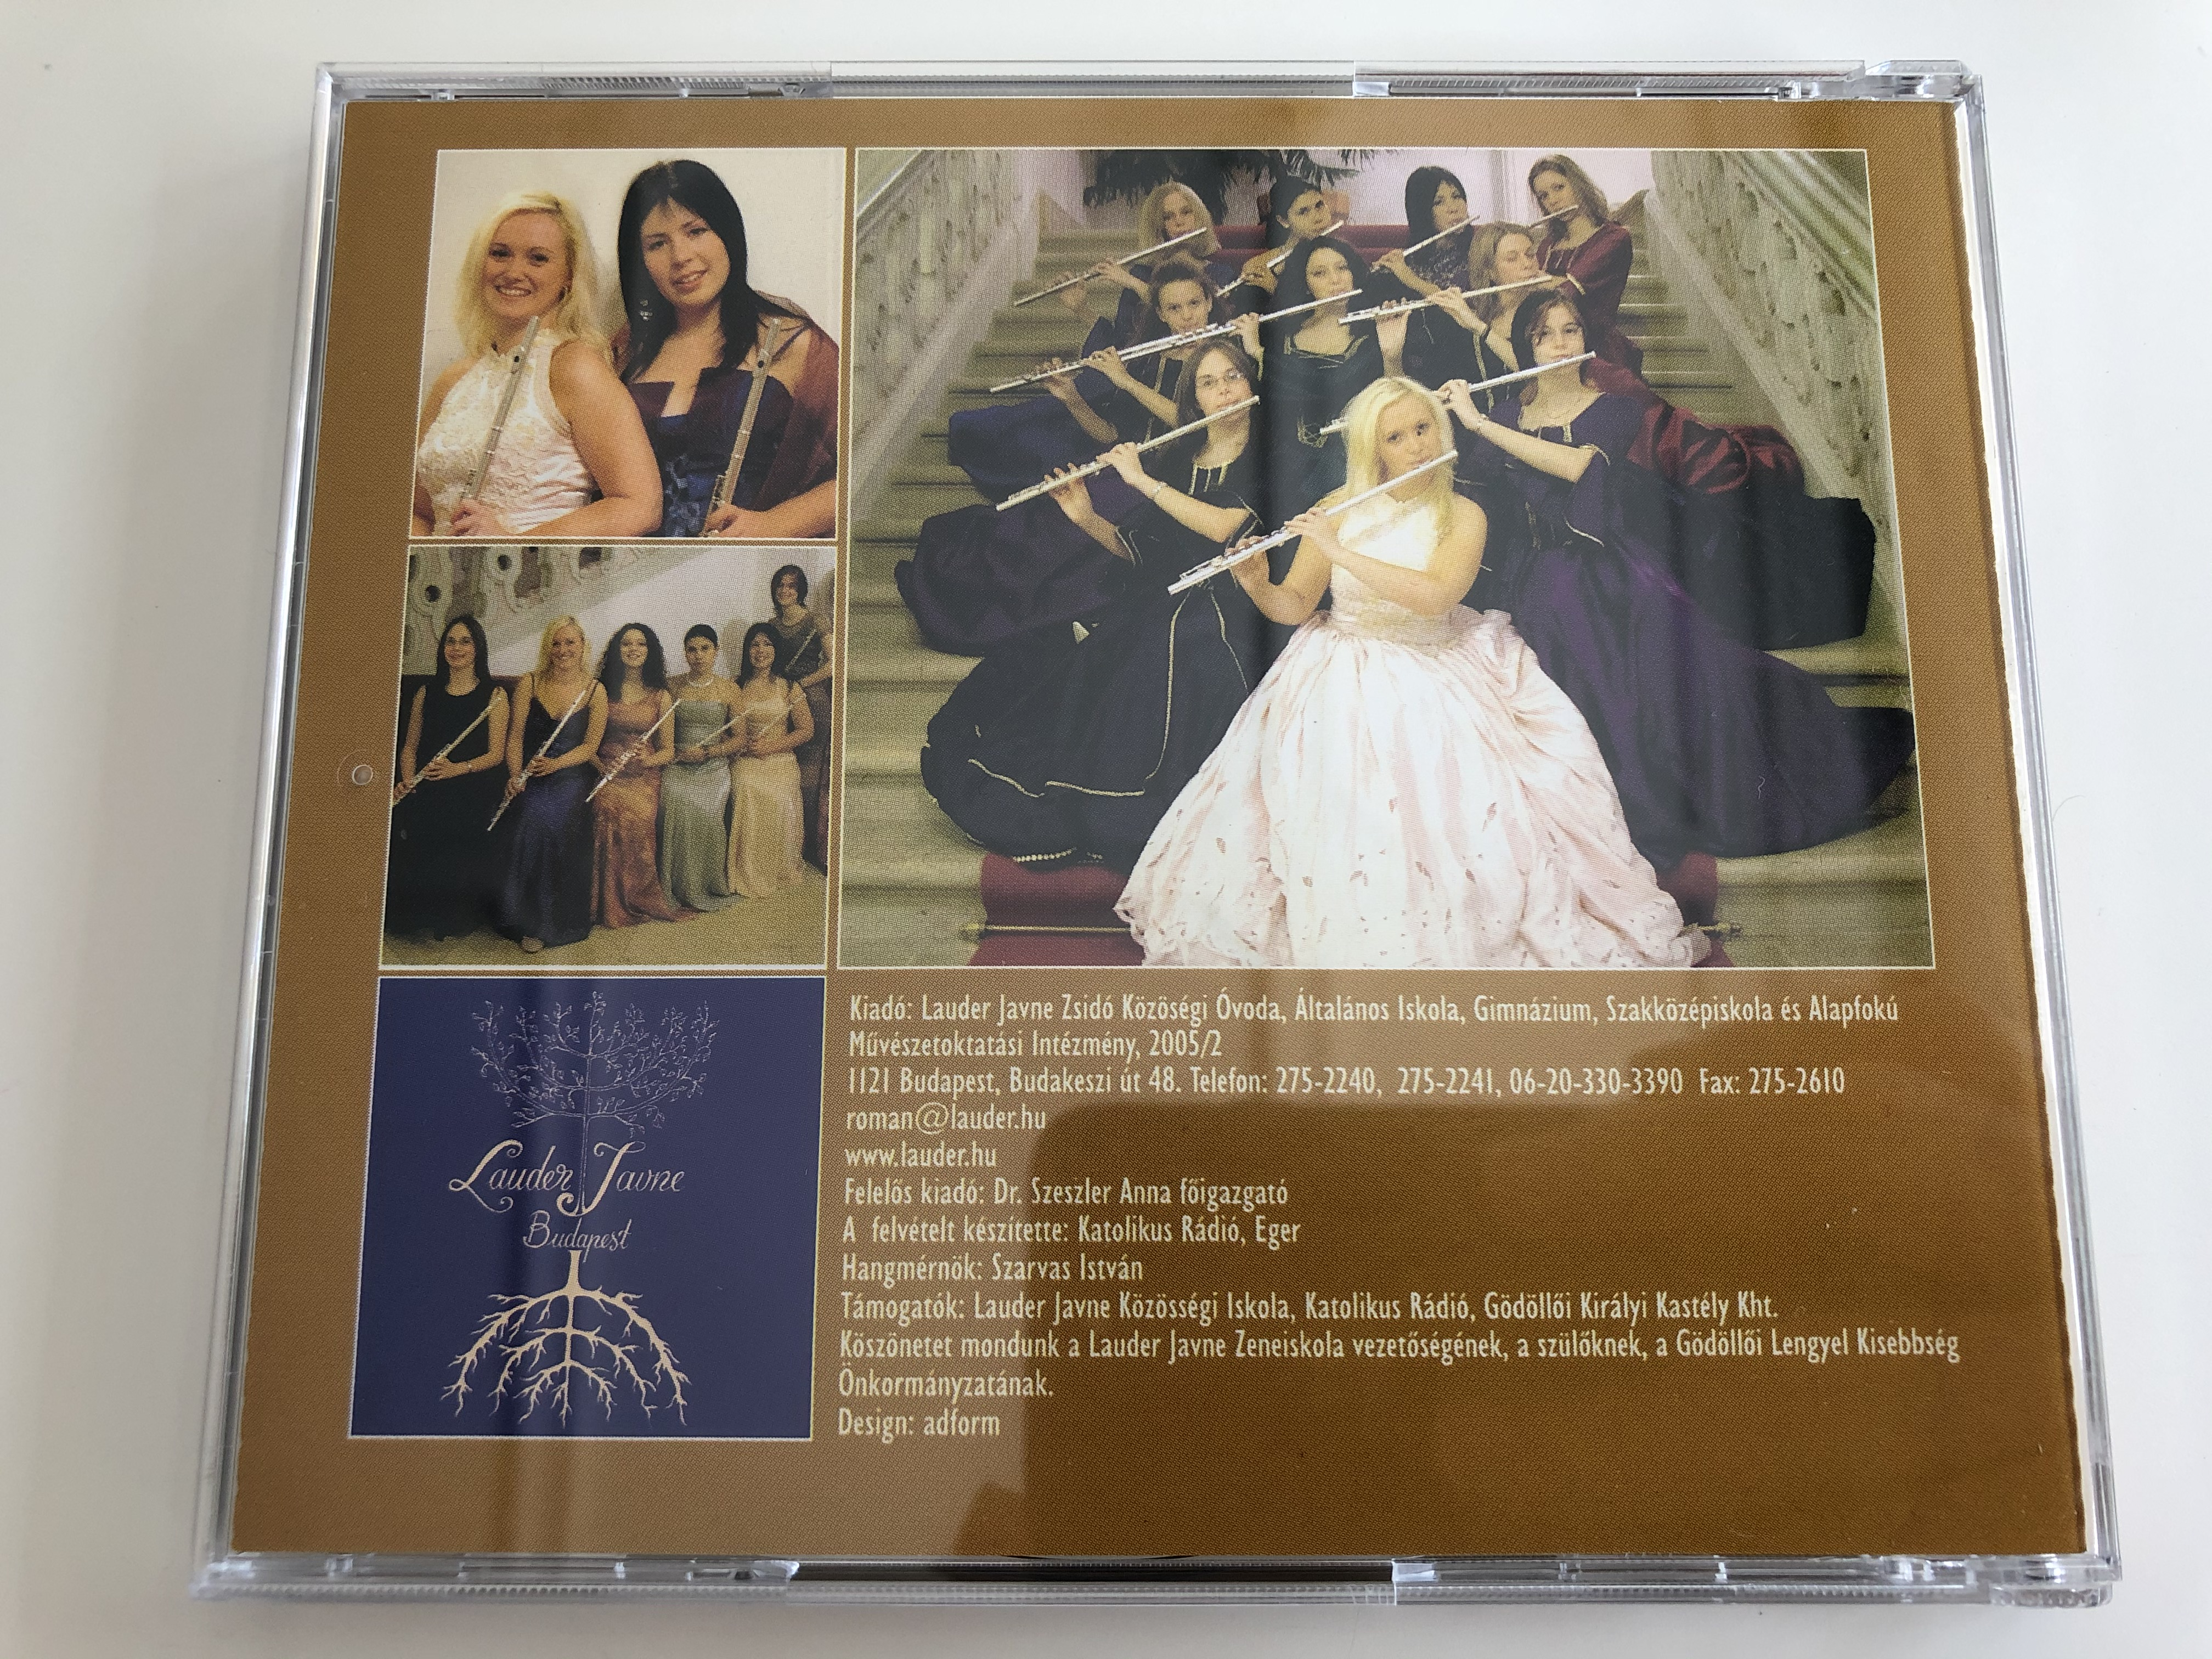 varazsfuvola-zenekar-dream-themes-sonya-cd-audio-cd-20052-6-.jpg